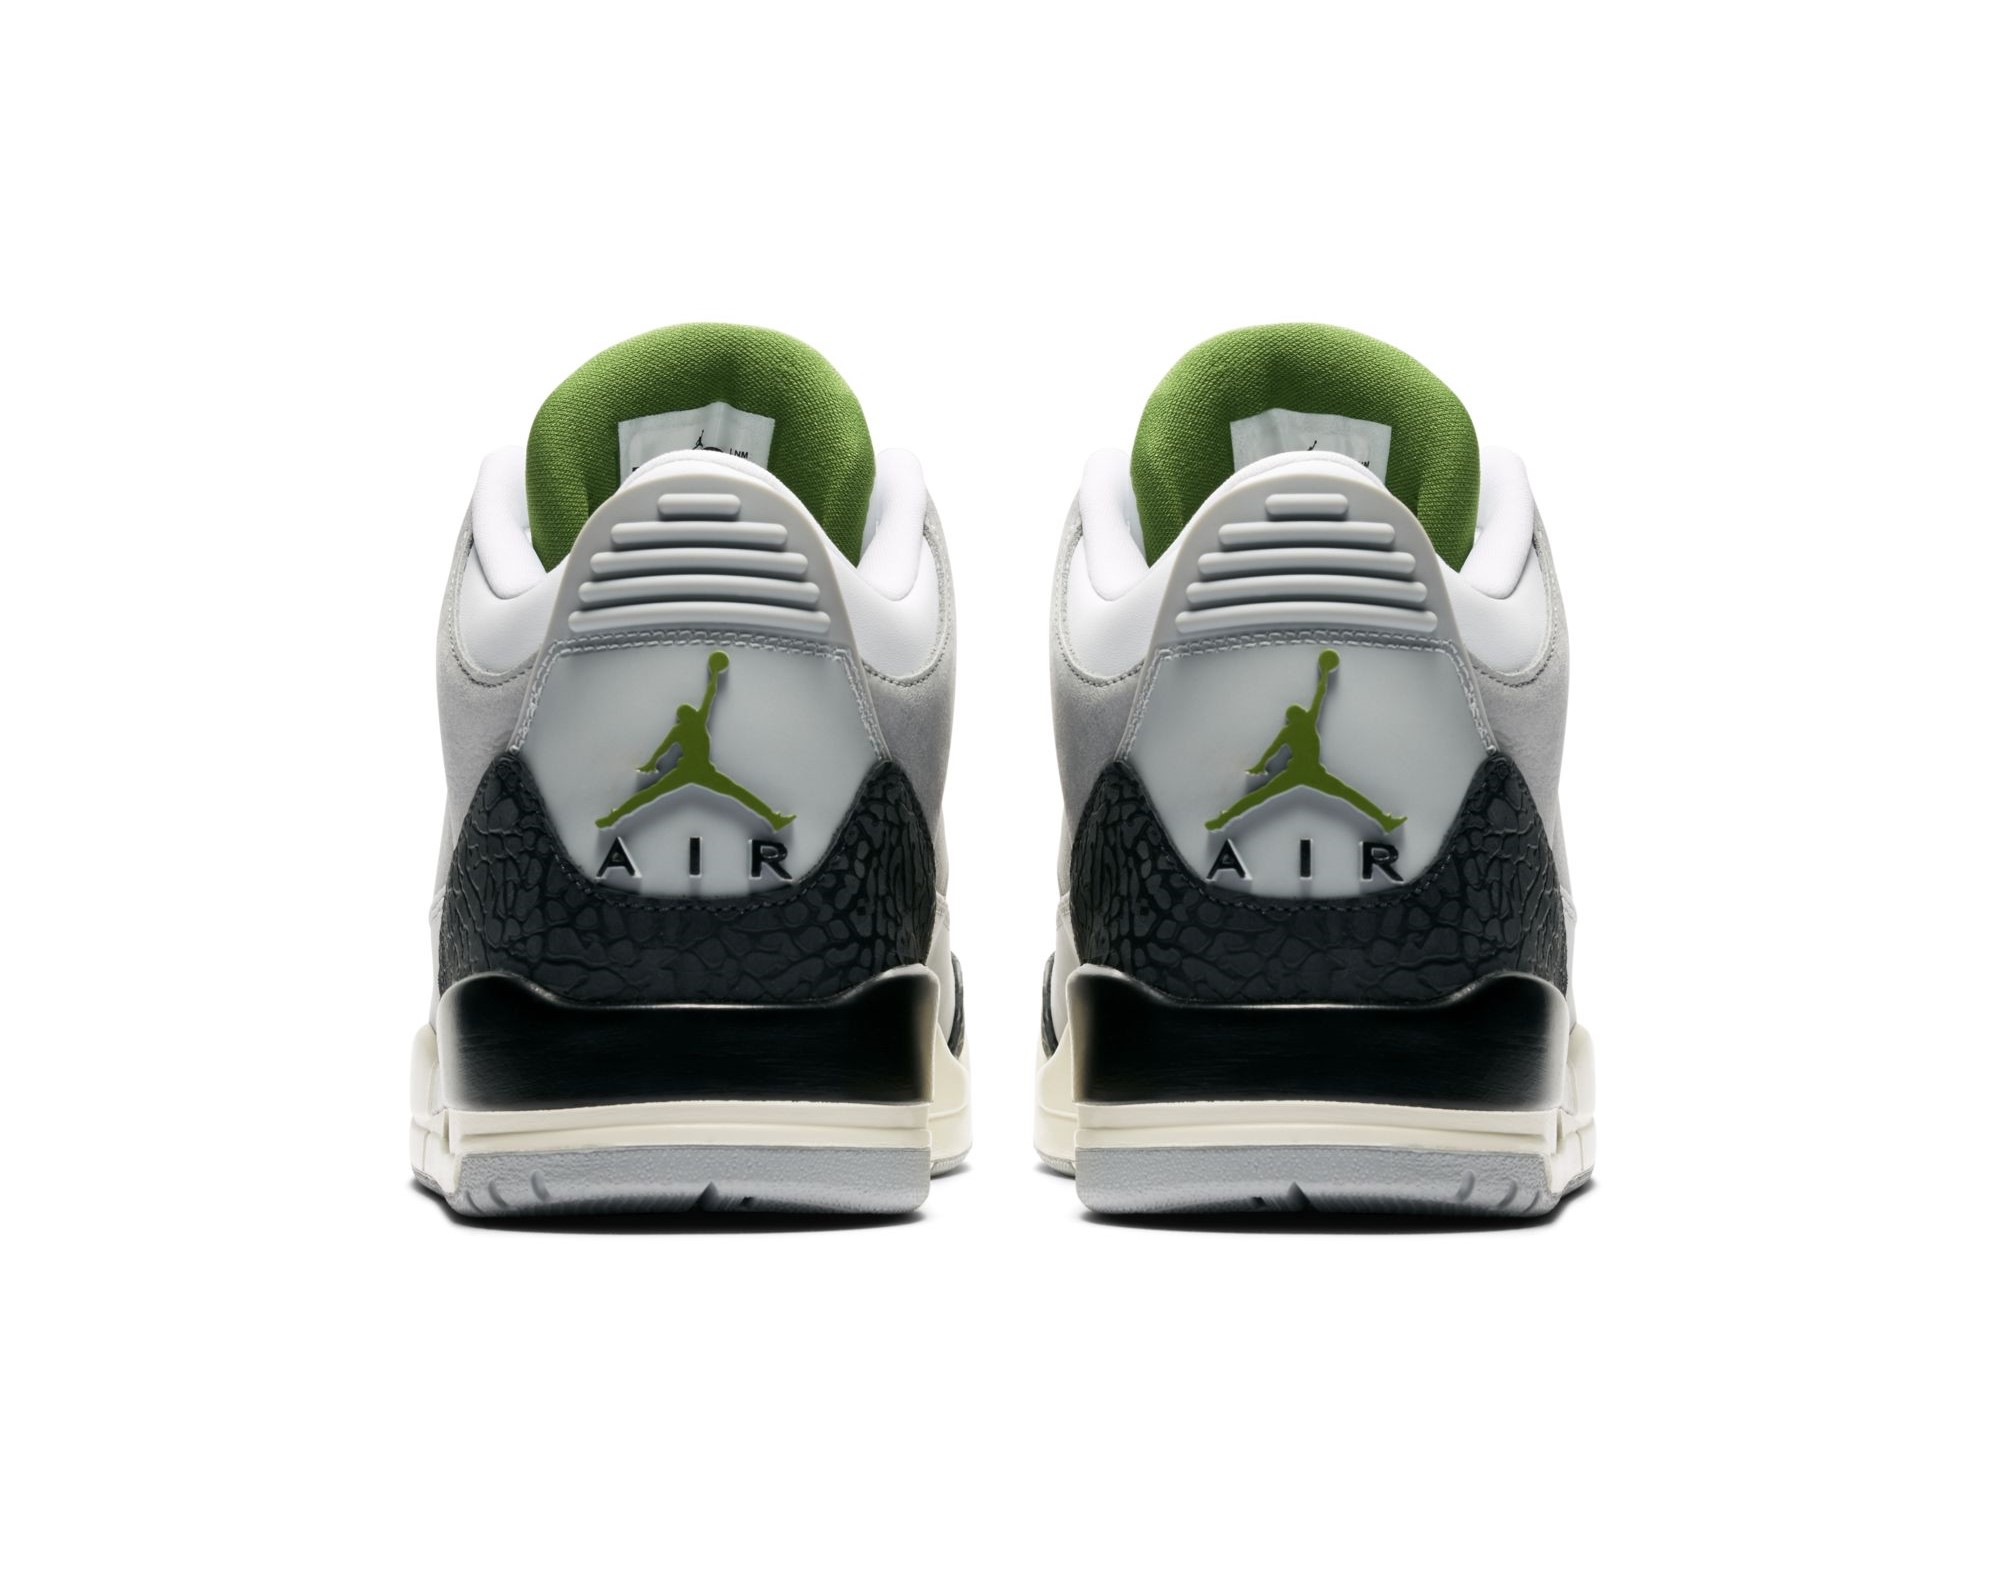 air jordan 3 Chlorophyll release date